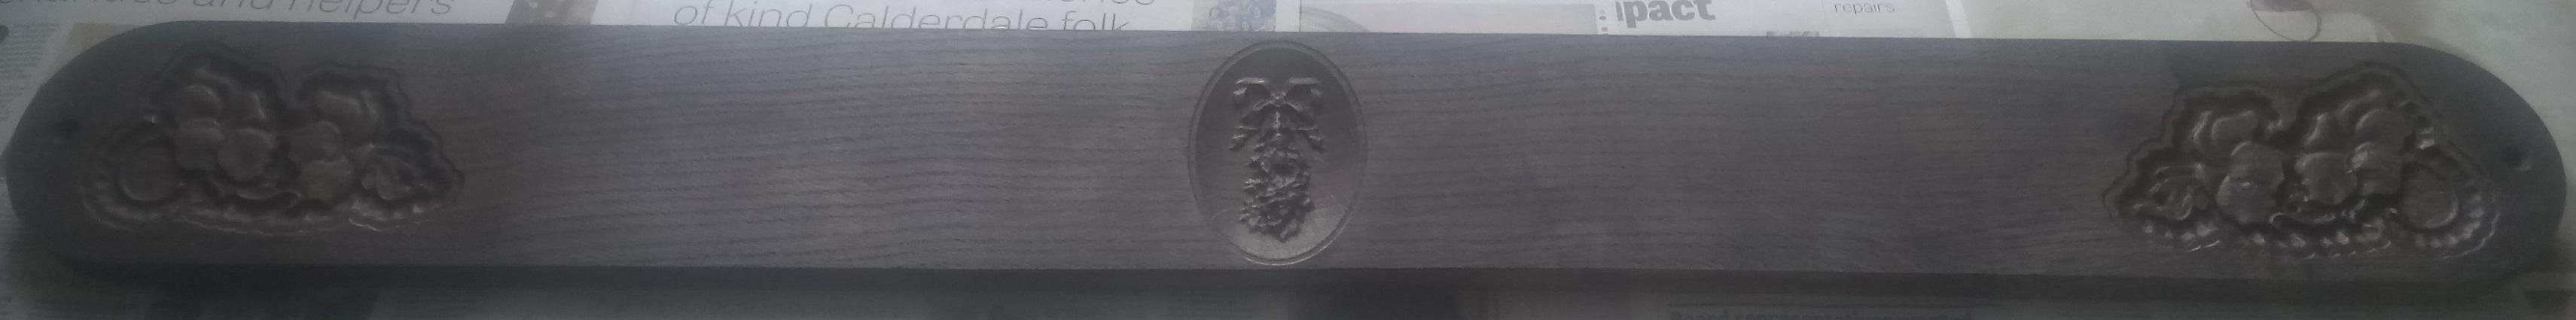 Coat rack 2.JPG